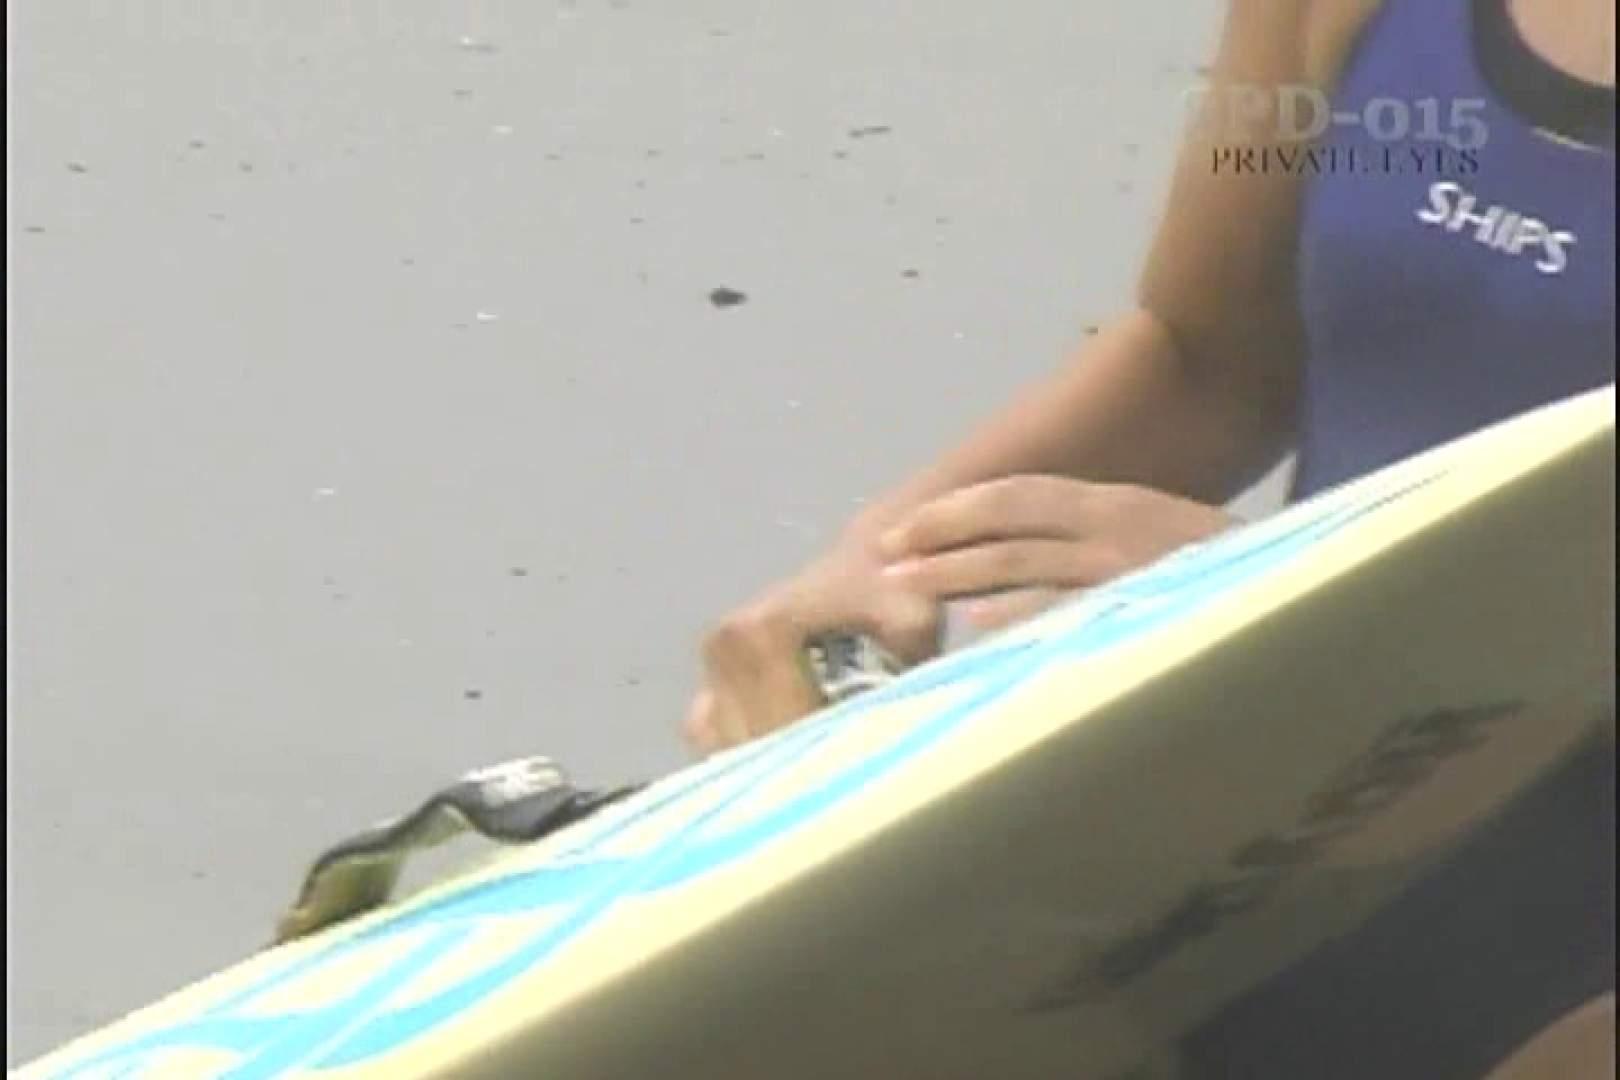 高画質版!SPD-015 全国学生ライフガード競技選手権大会 in湘南海岸 高画質  105PIX 75